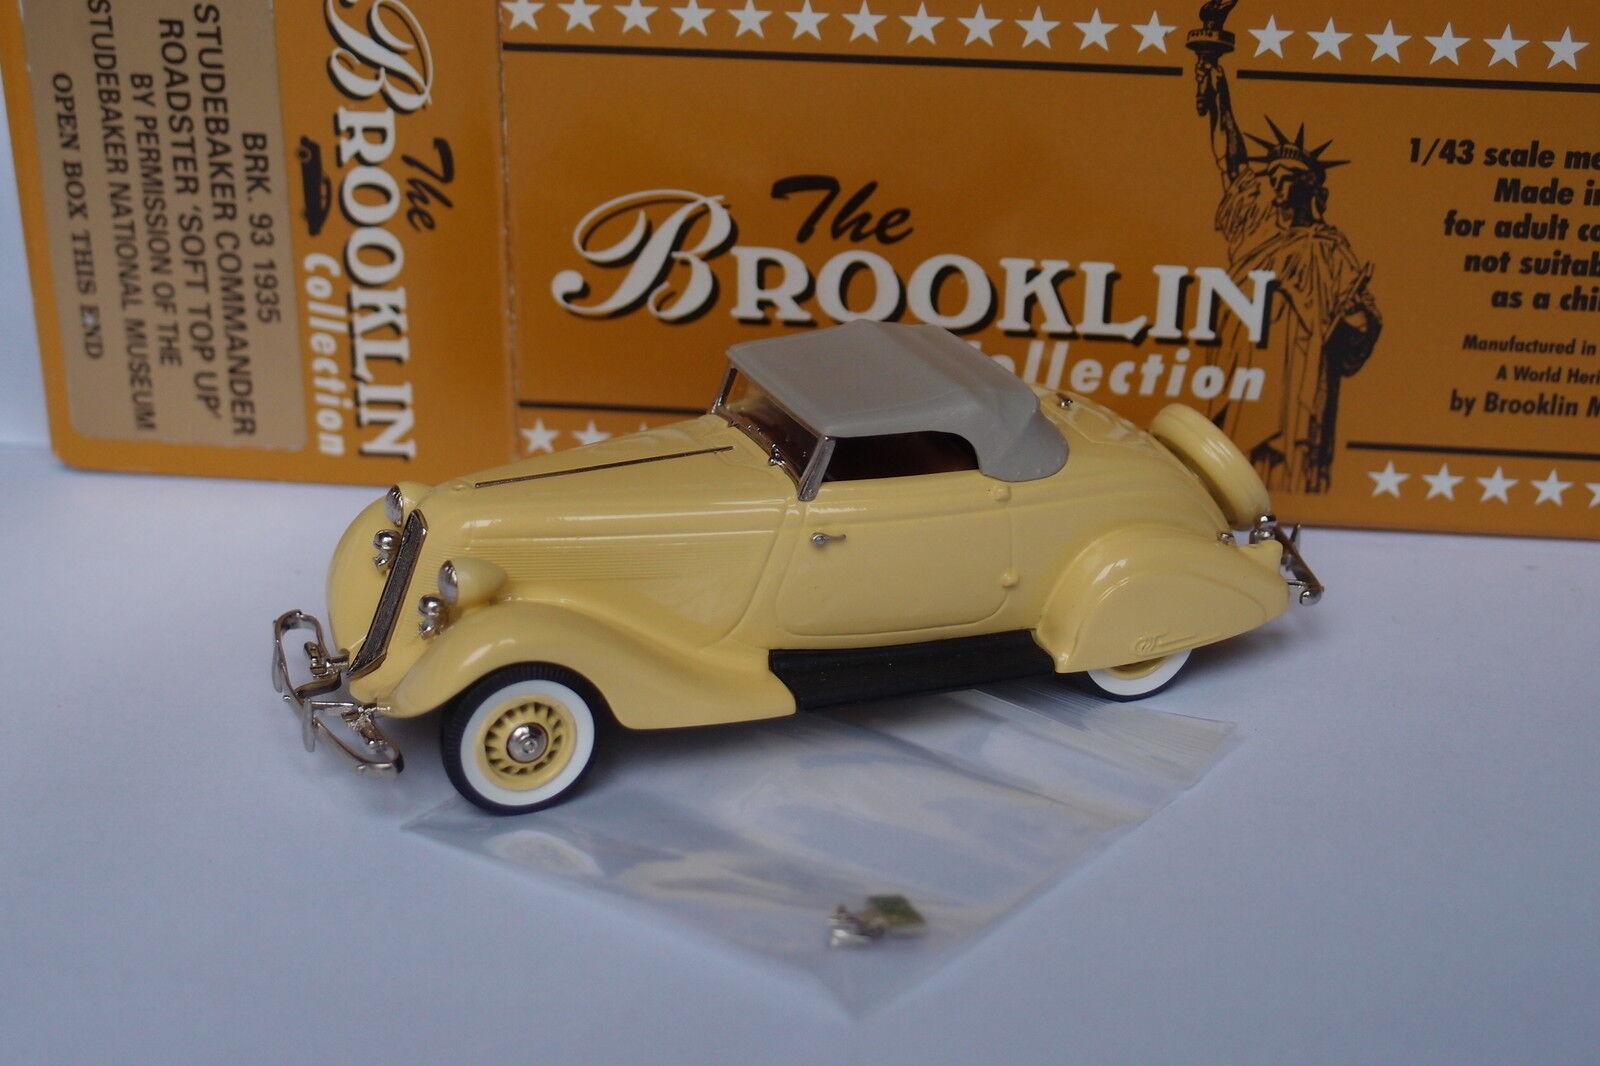 Brooklin brk - 93 1935 studebaker - roadster - Grünck bis 1   43